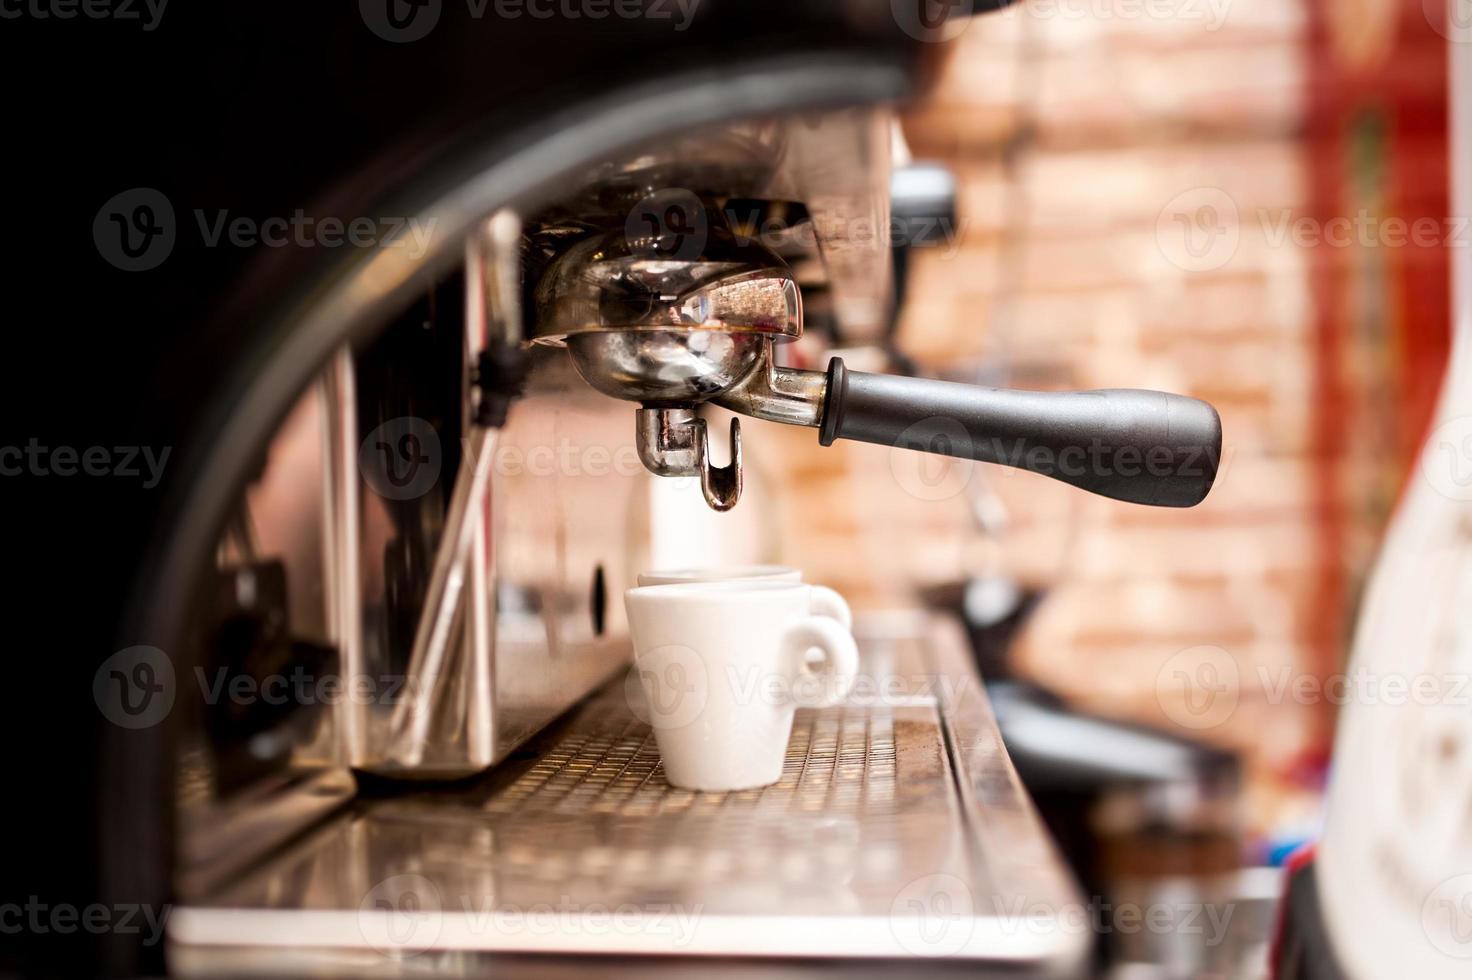 machine preparing espresso in coffee shop or bar photo